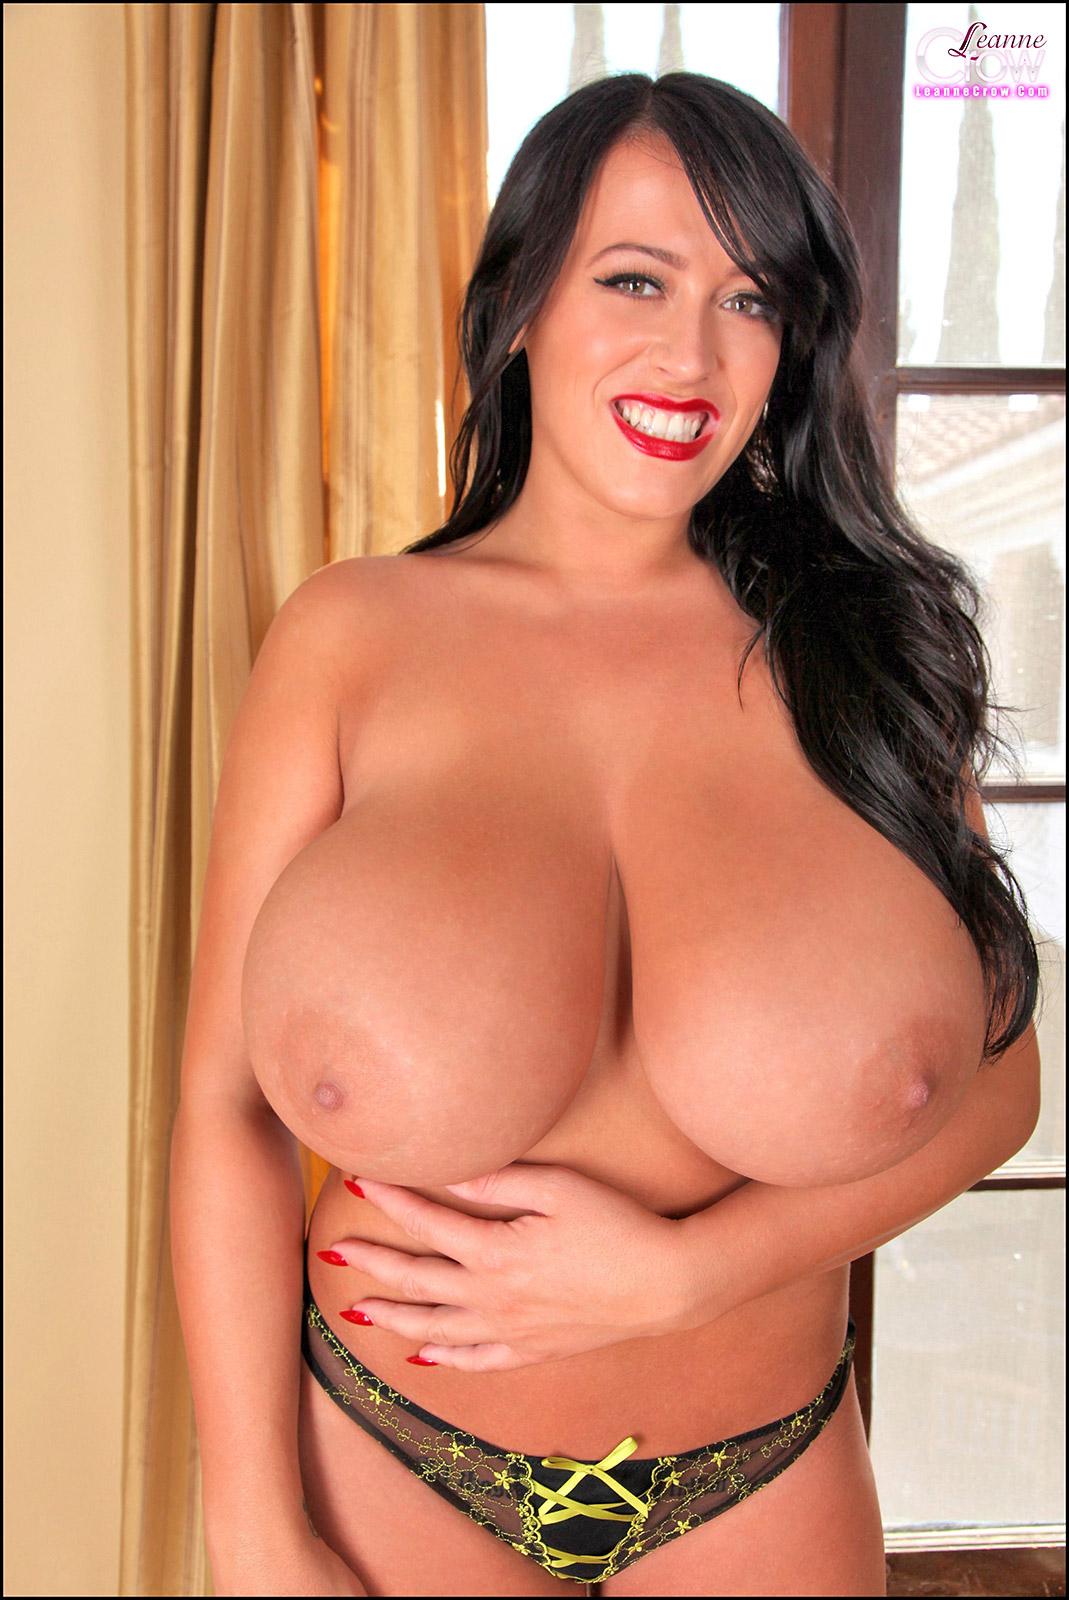 Leanne crow nude